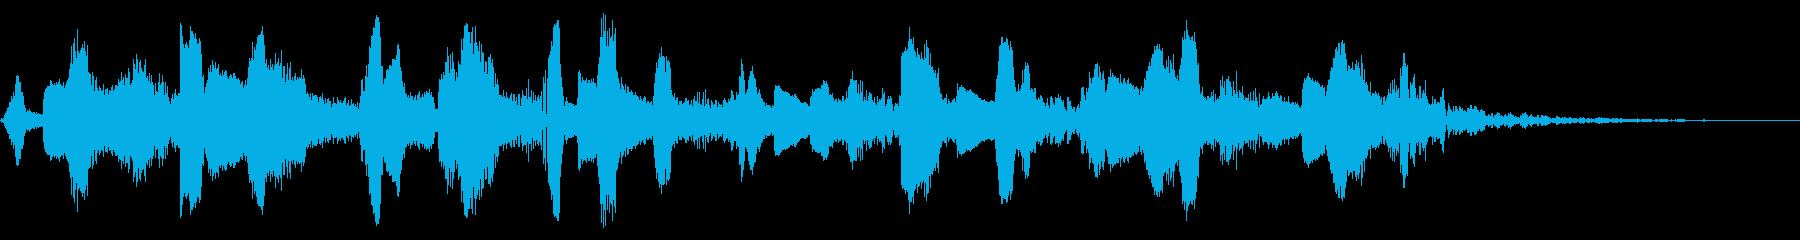 SF映画 宇宙空間のロボットの音の再生済みの波形